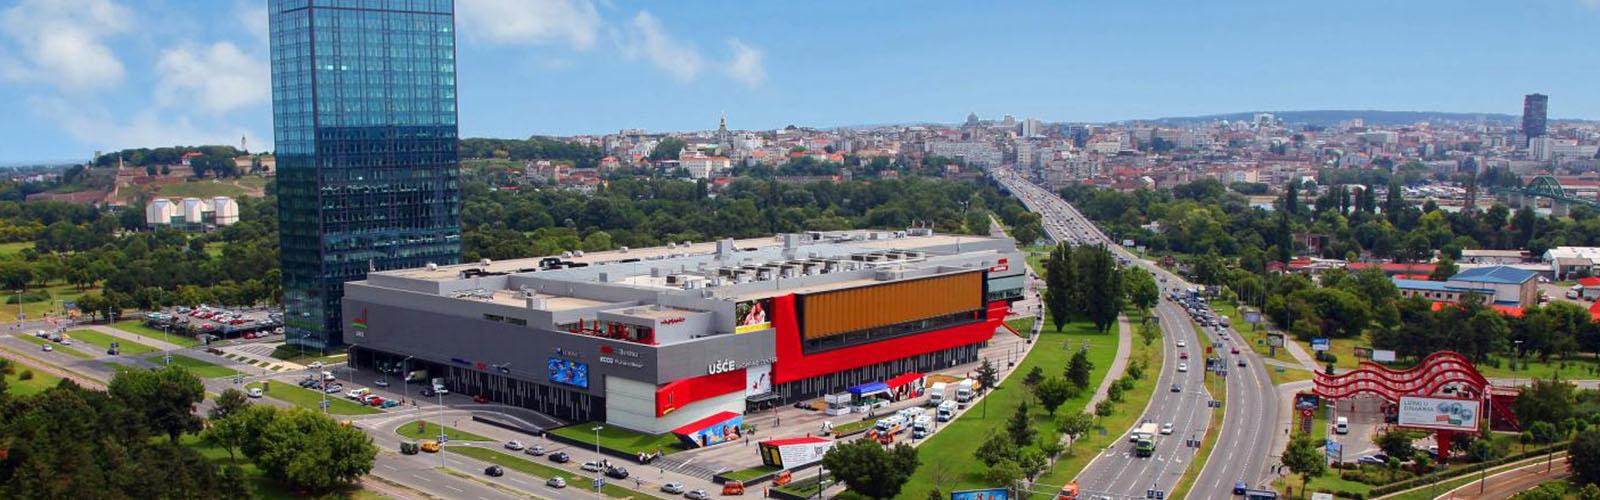 Concierge Belgrade | Usce shopping mall